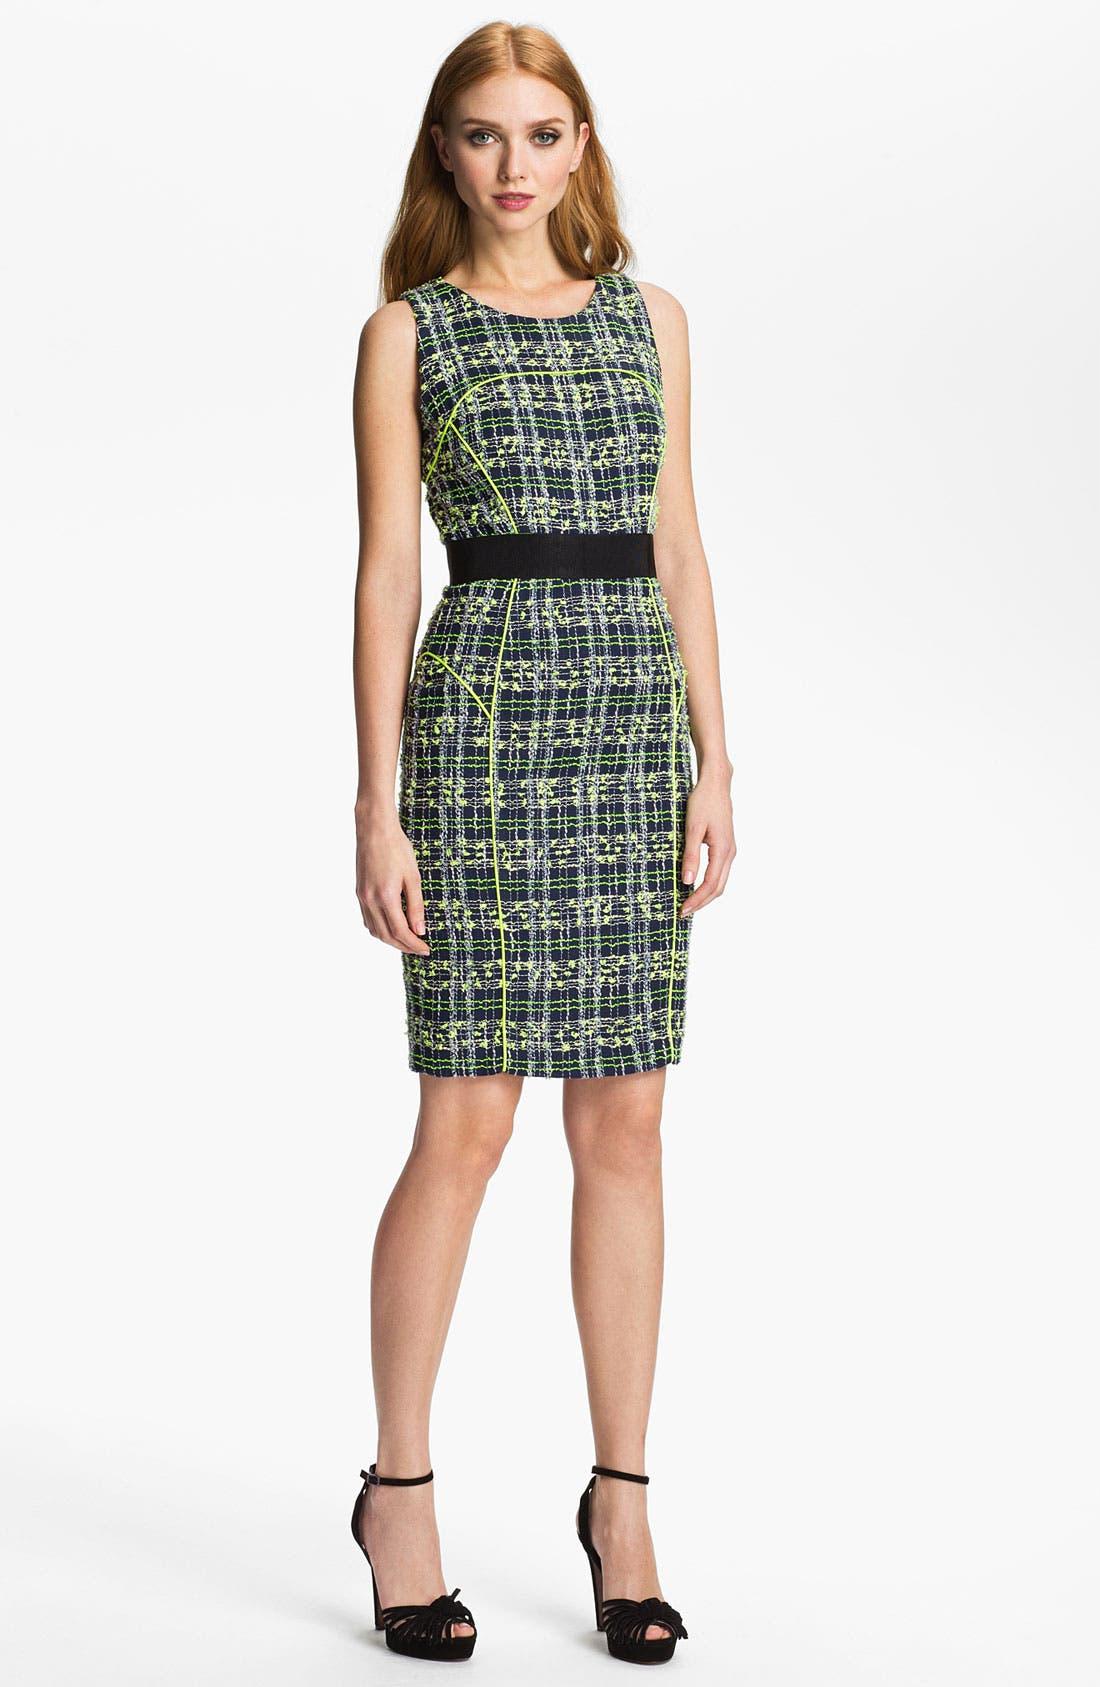 Alternate Image 1 Selected - Milly 'Jasmine' Tweed Sheath Dress